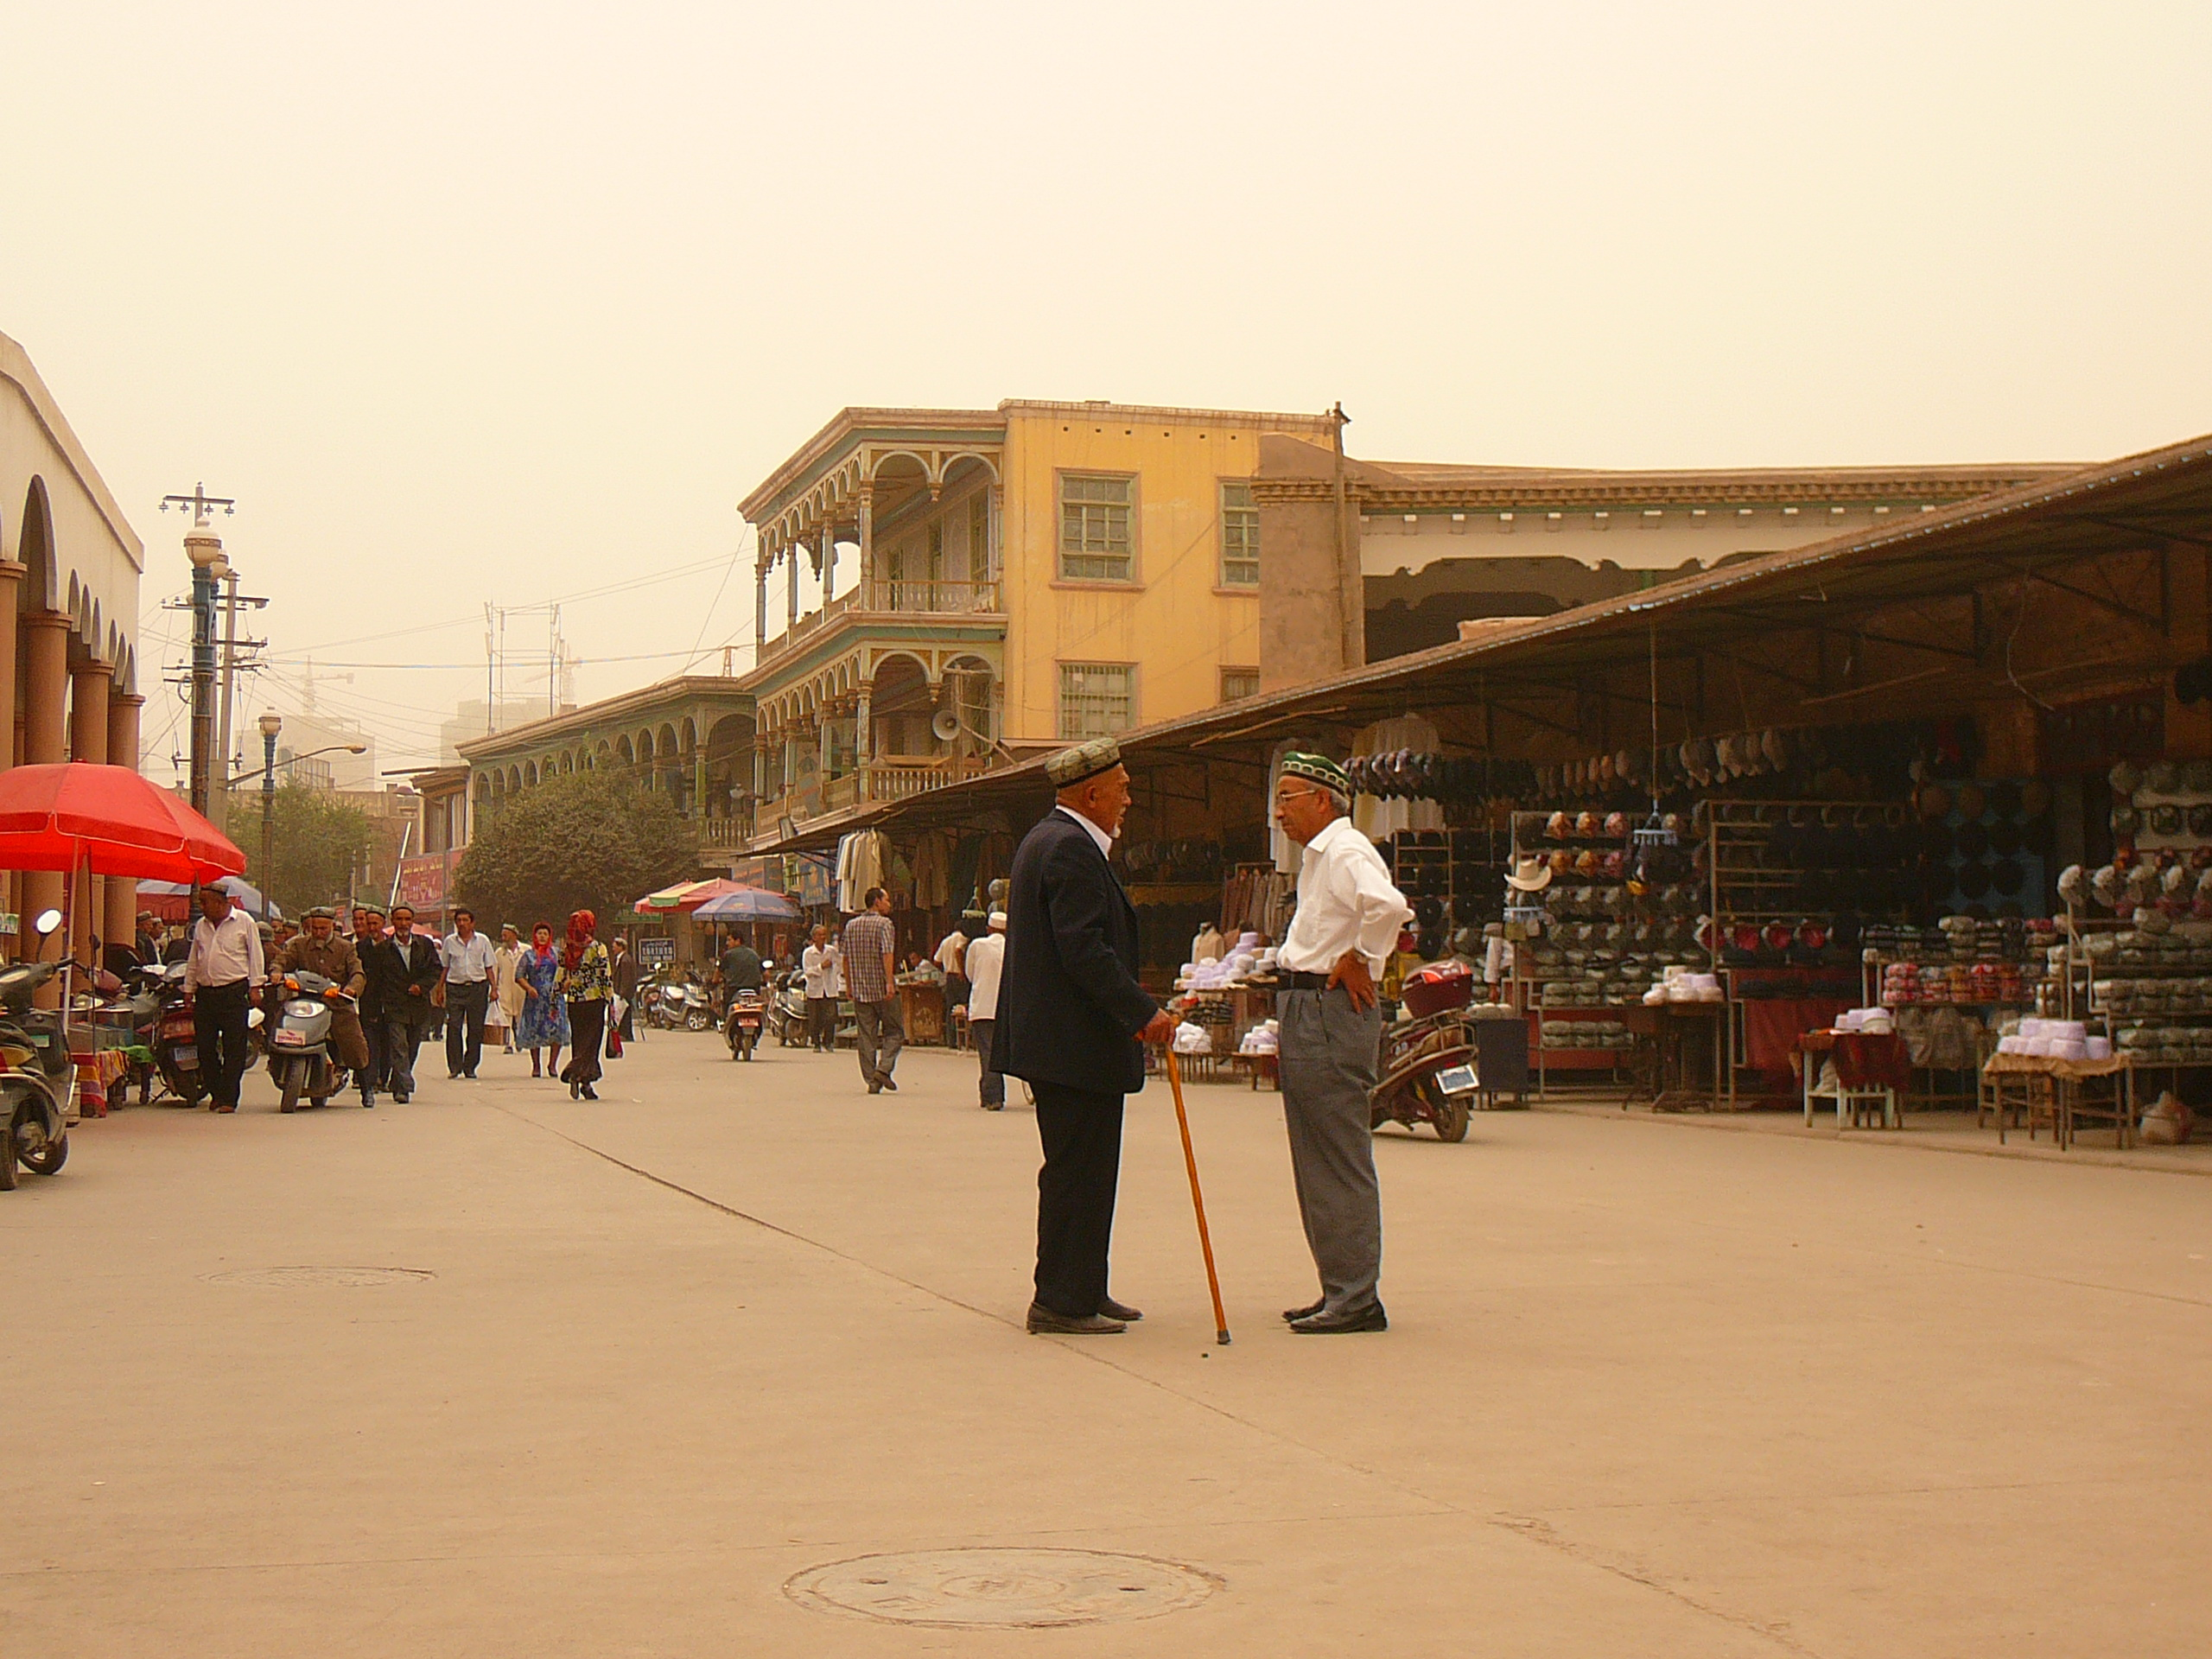 Уйгурия, Кашгар, Сидзян